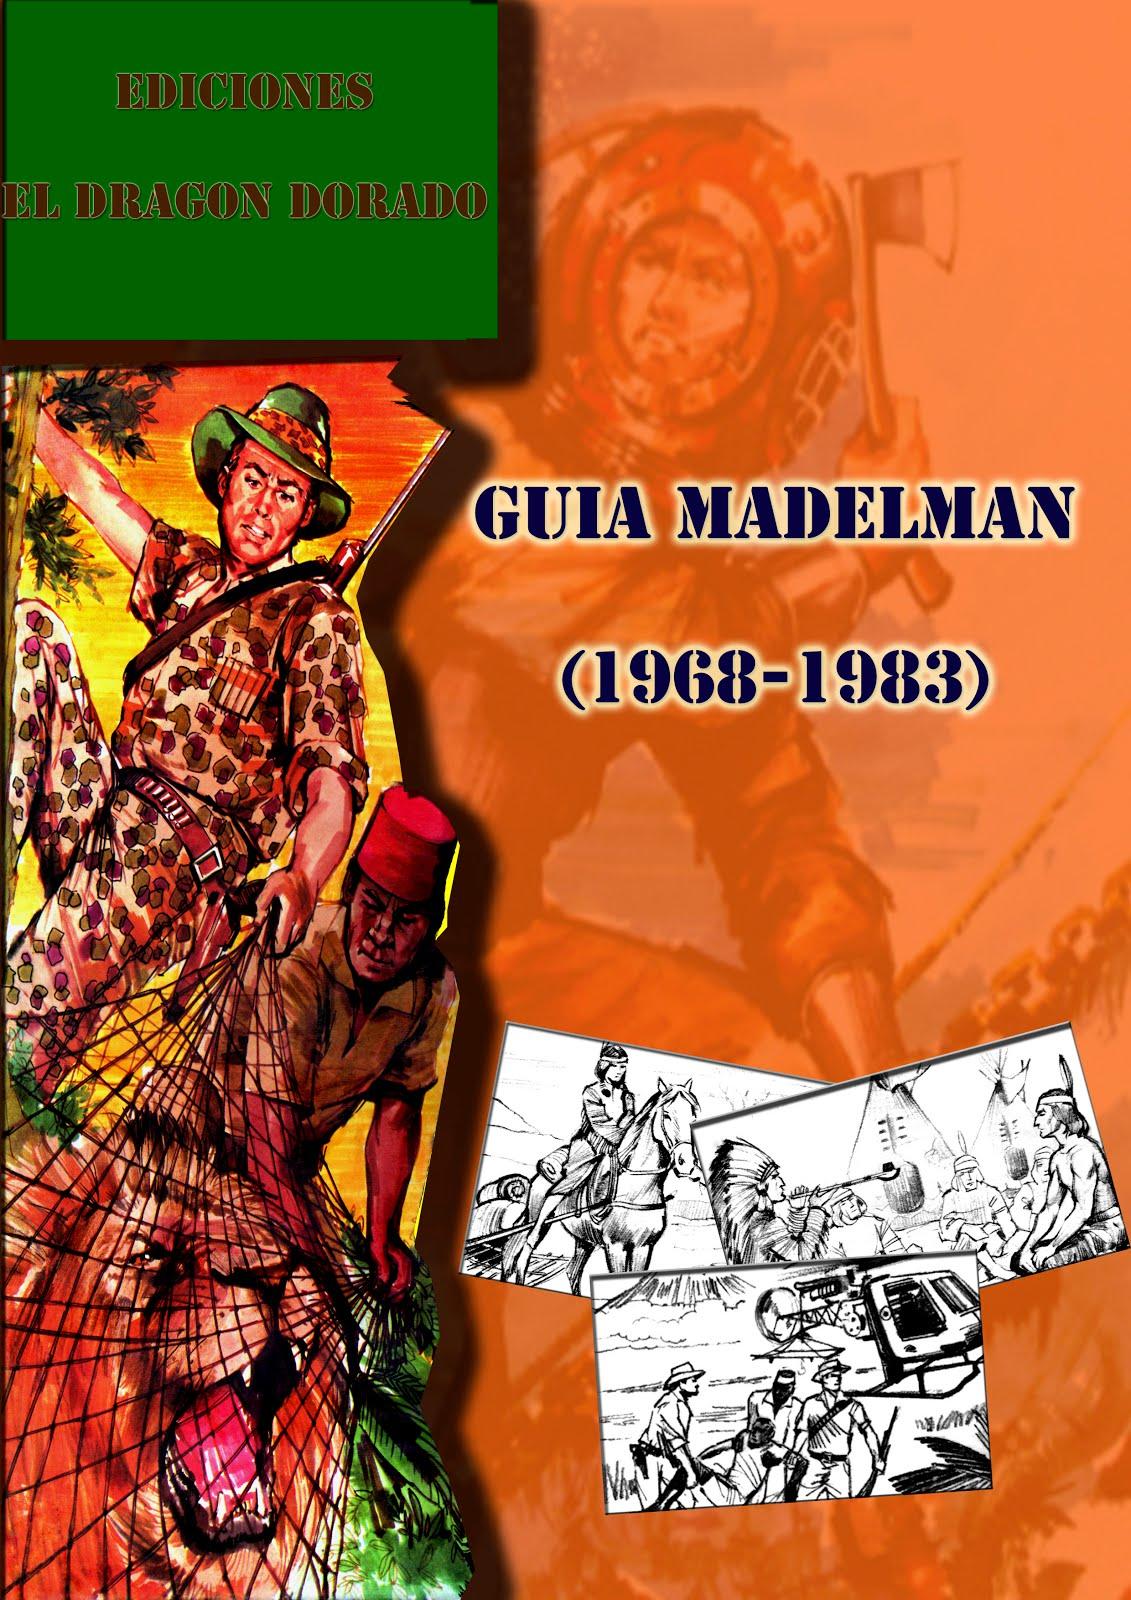 GUIA MADELMAN